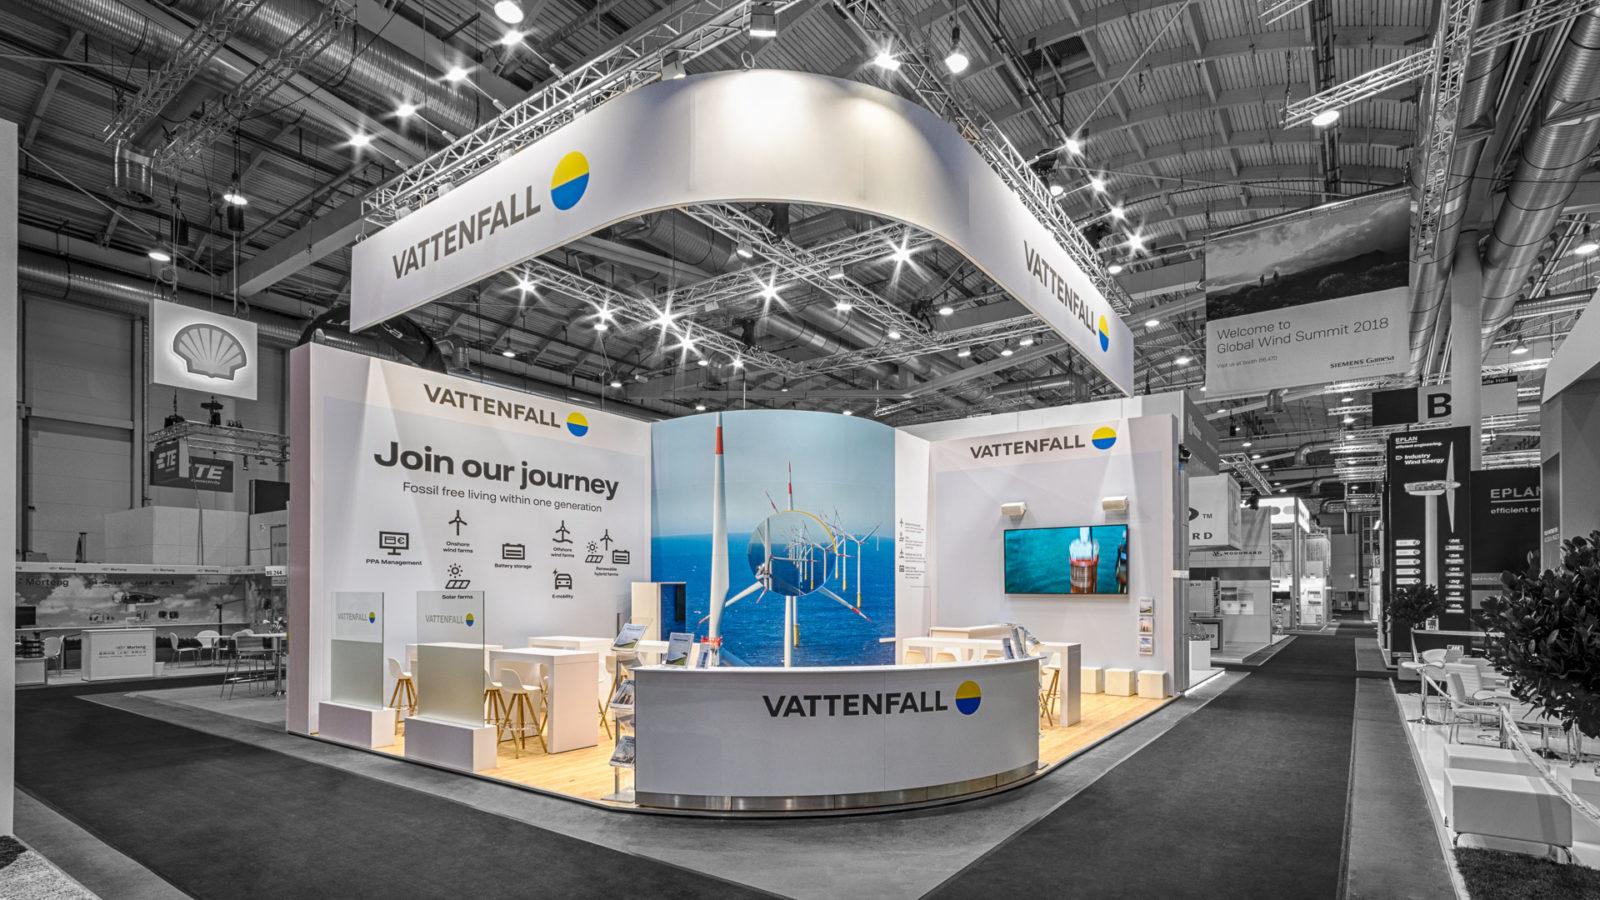 Vattenfall<br>64 m²<br>Hamburg WindEnergy